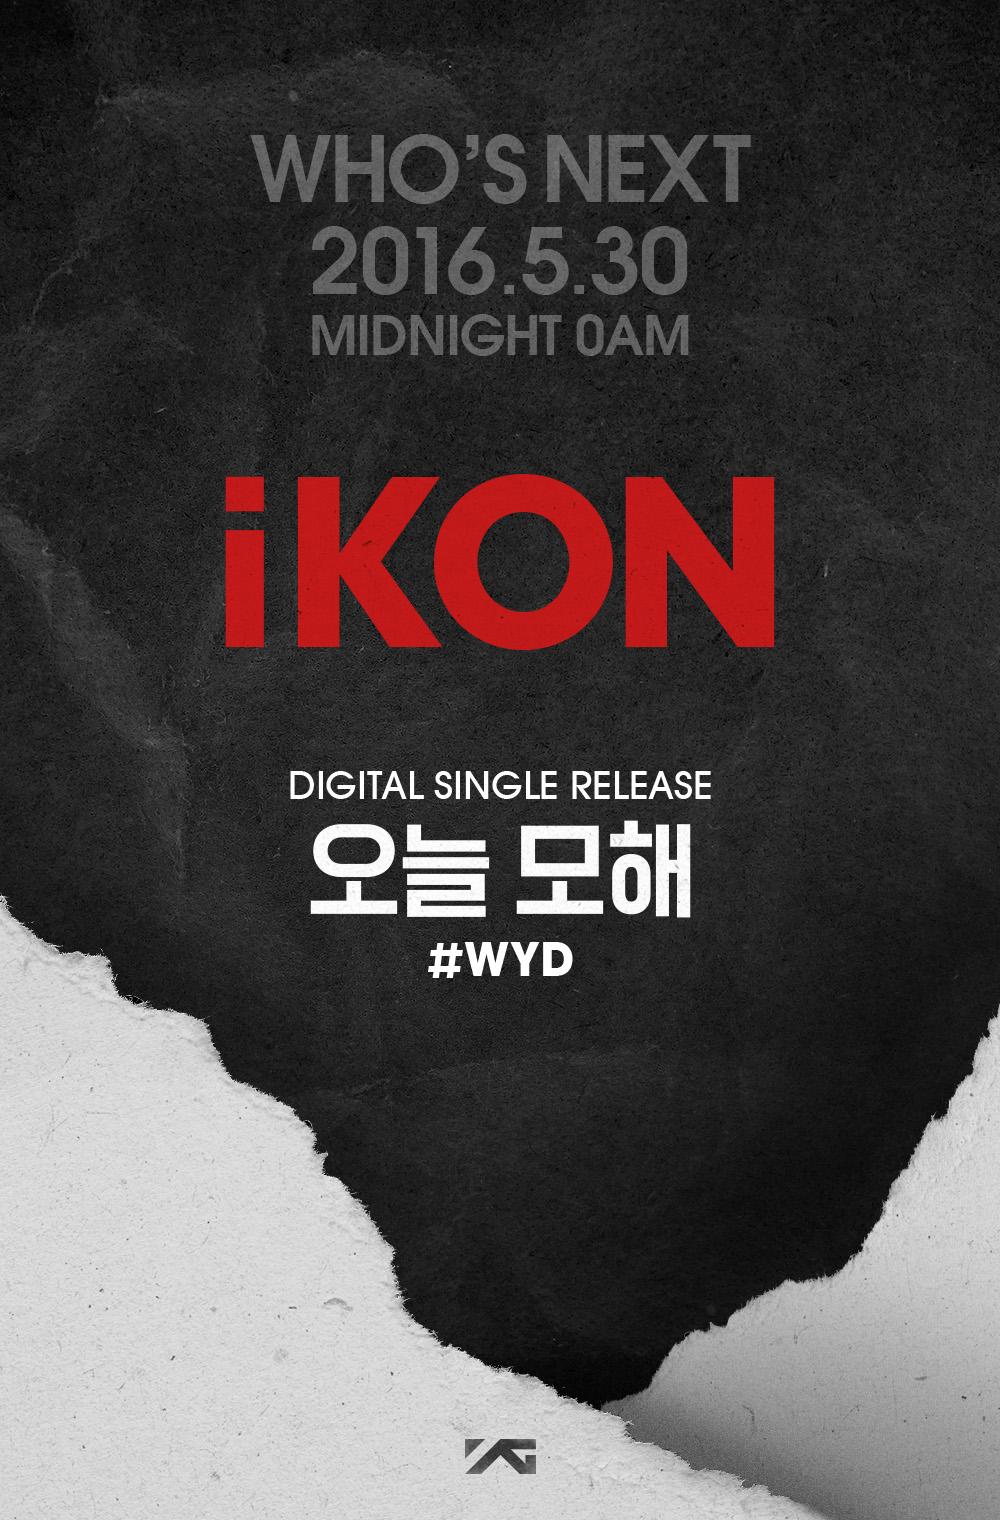 Update: YG Entertainment Reveals iKON Is Next